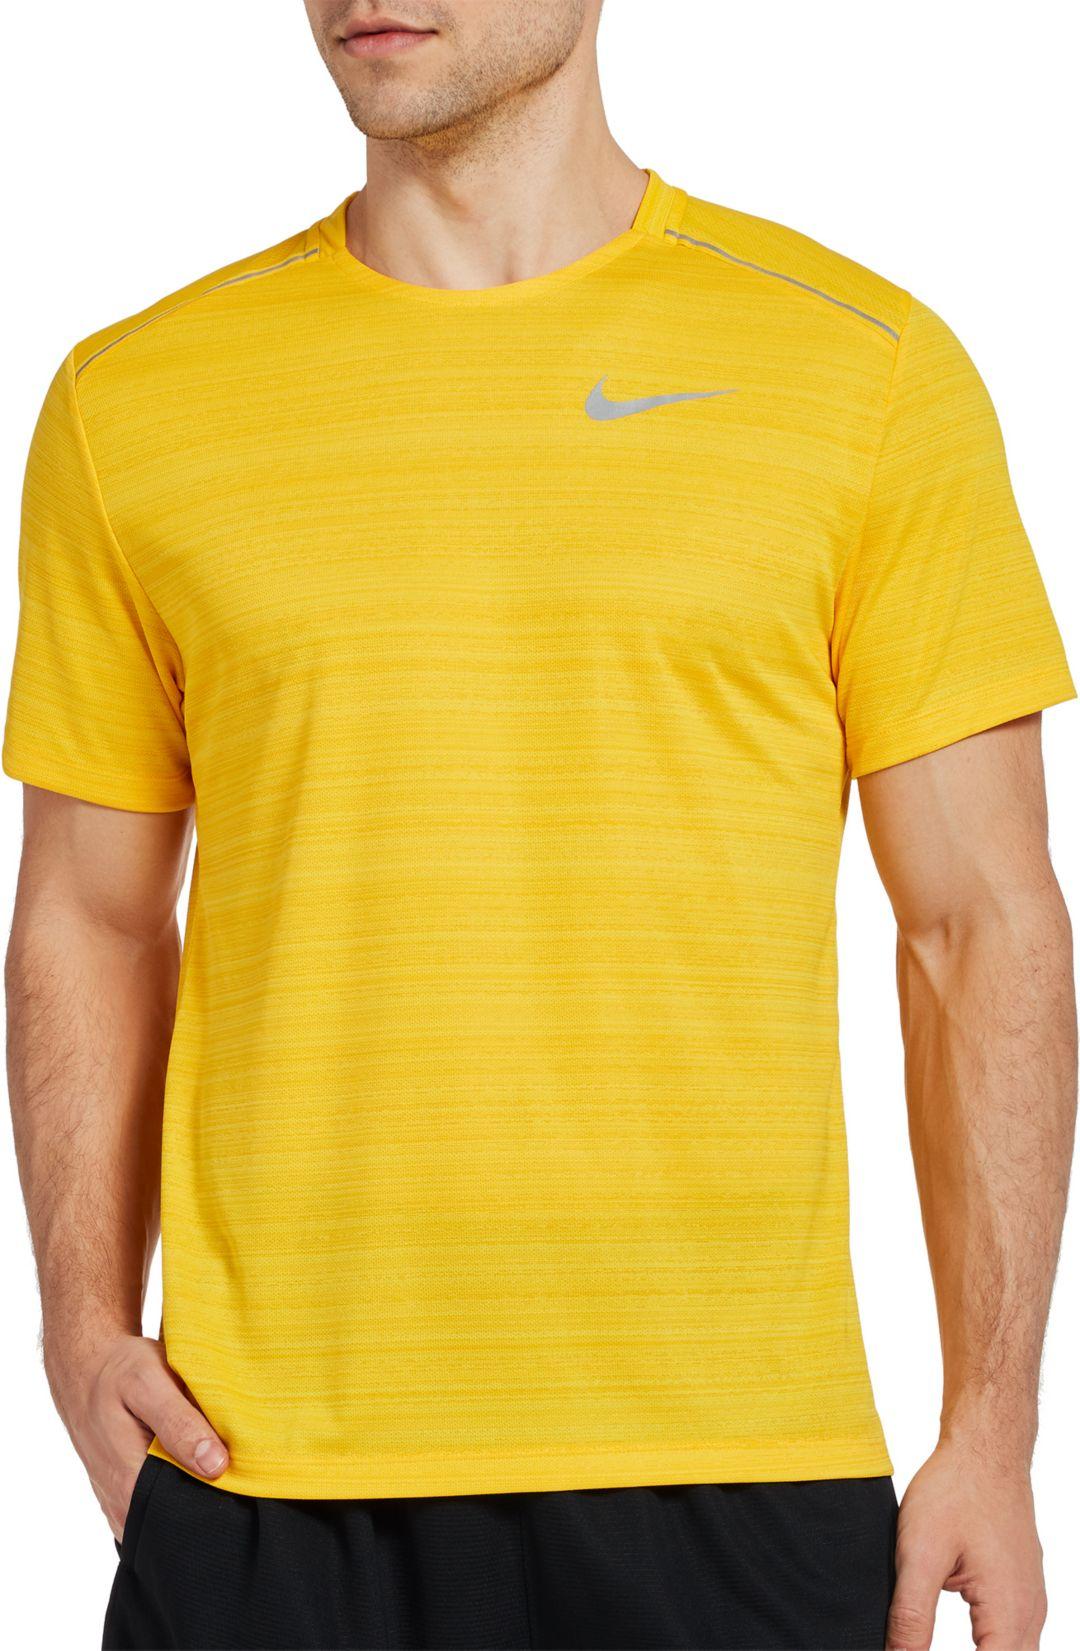 492f84a403dae Nike Men's Dry Miler T-Shirt | DICK'S Sporting Goods